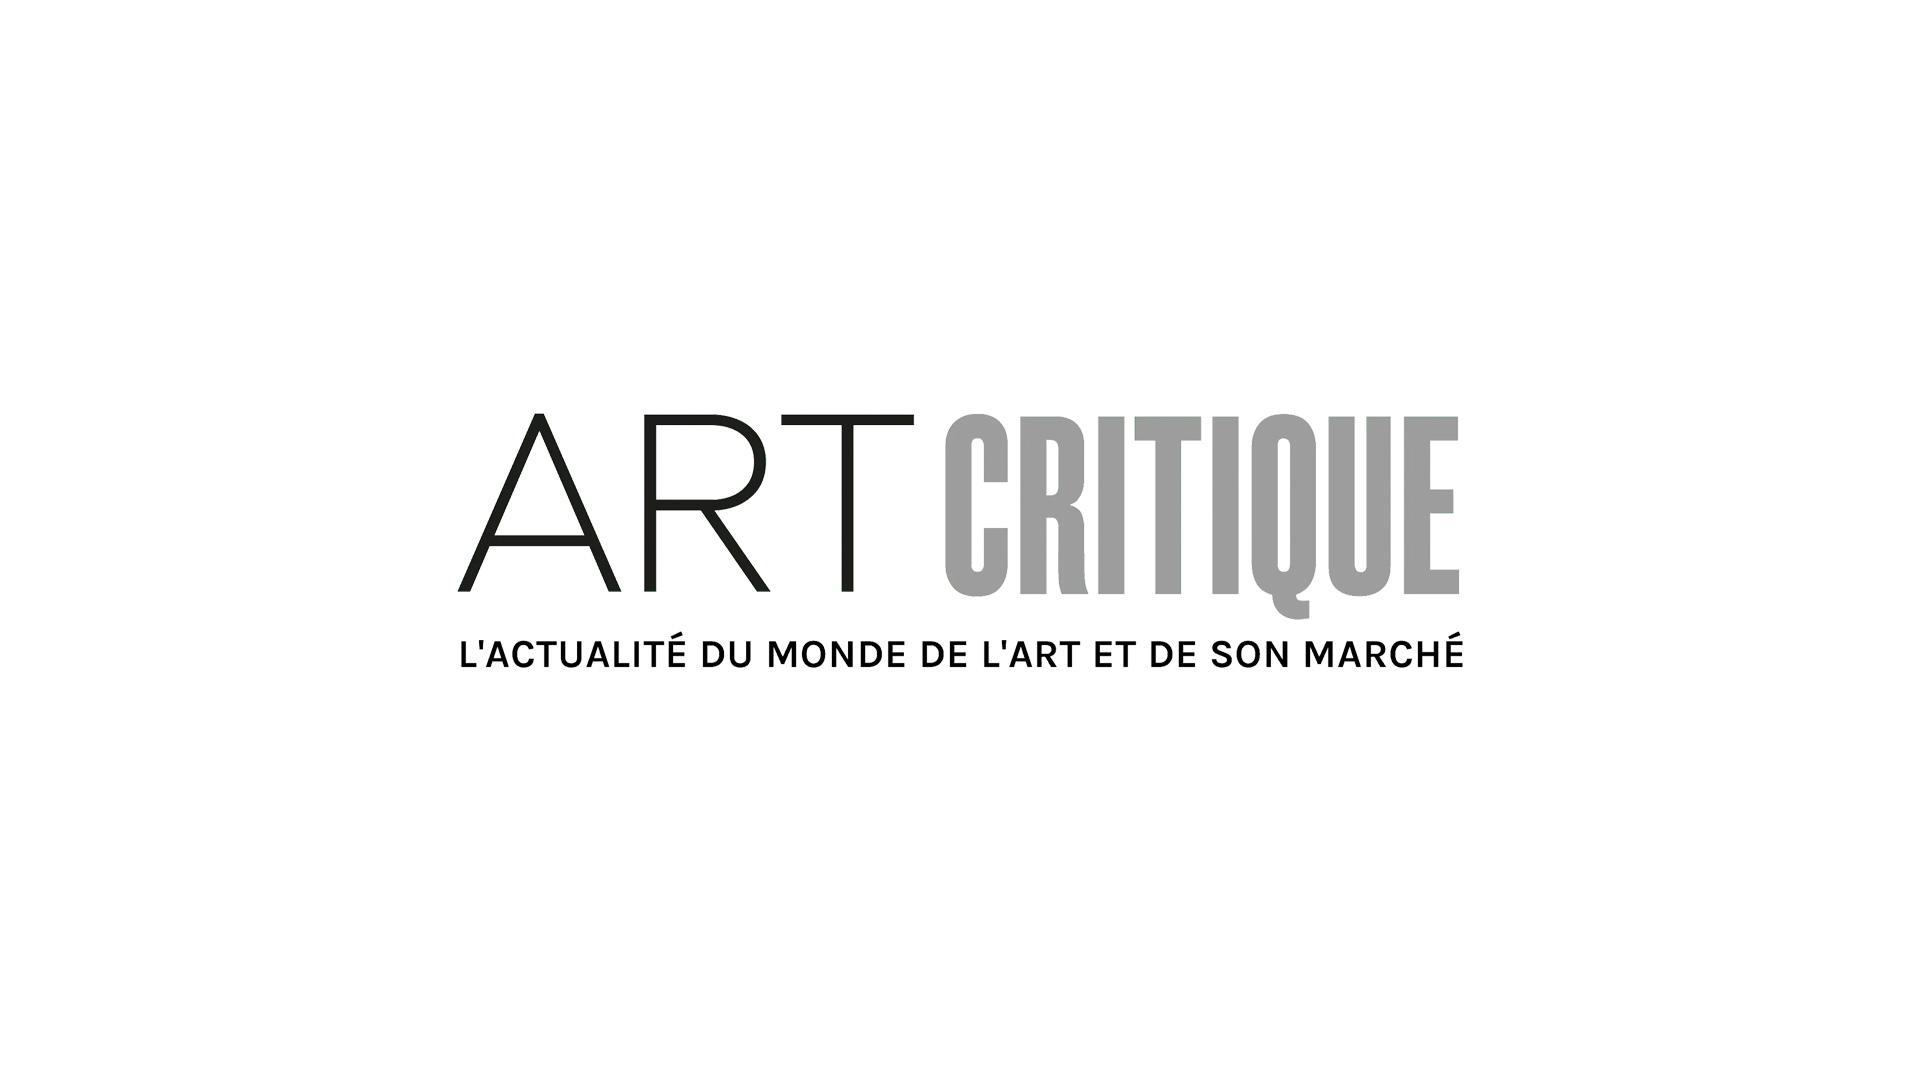 Pour Florence et pour Tomaso Montanari